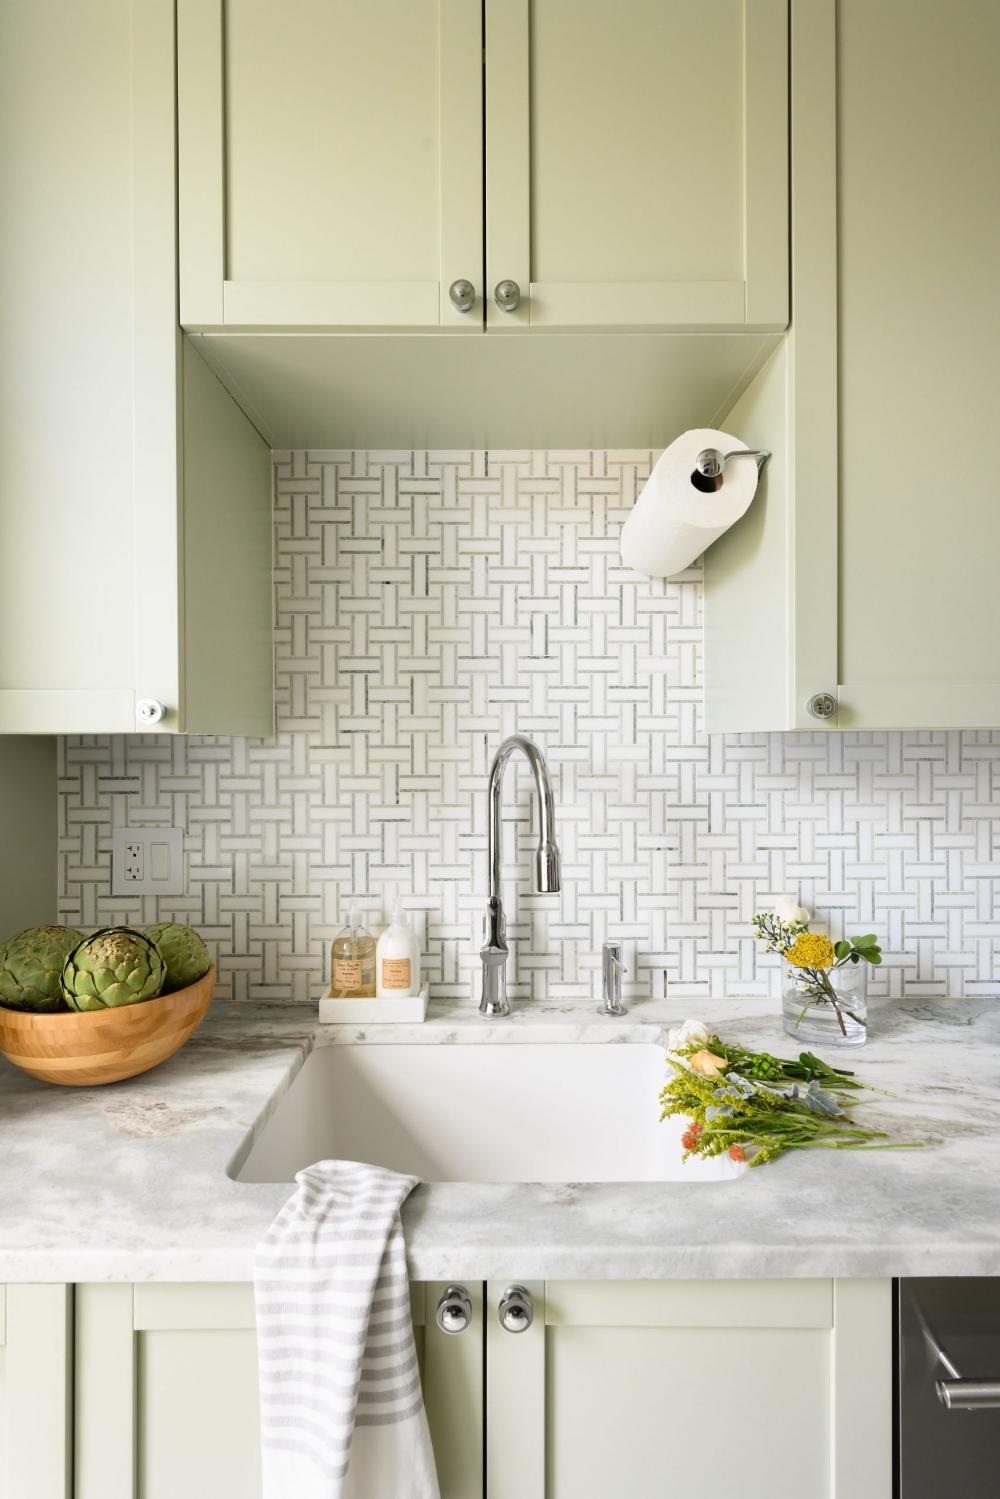 South Boston Kitchen C B Hughes In 2020 Kitchen South Boston Kitchens Bathrooms